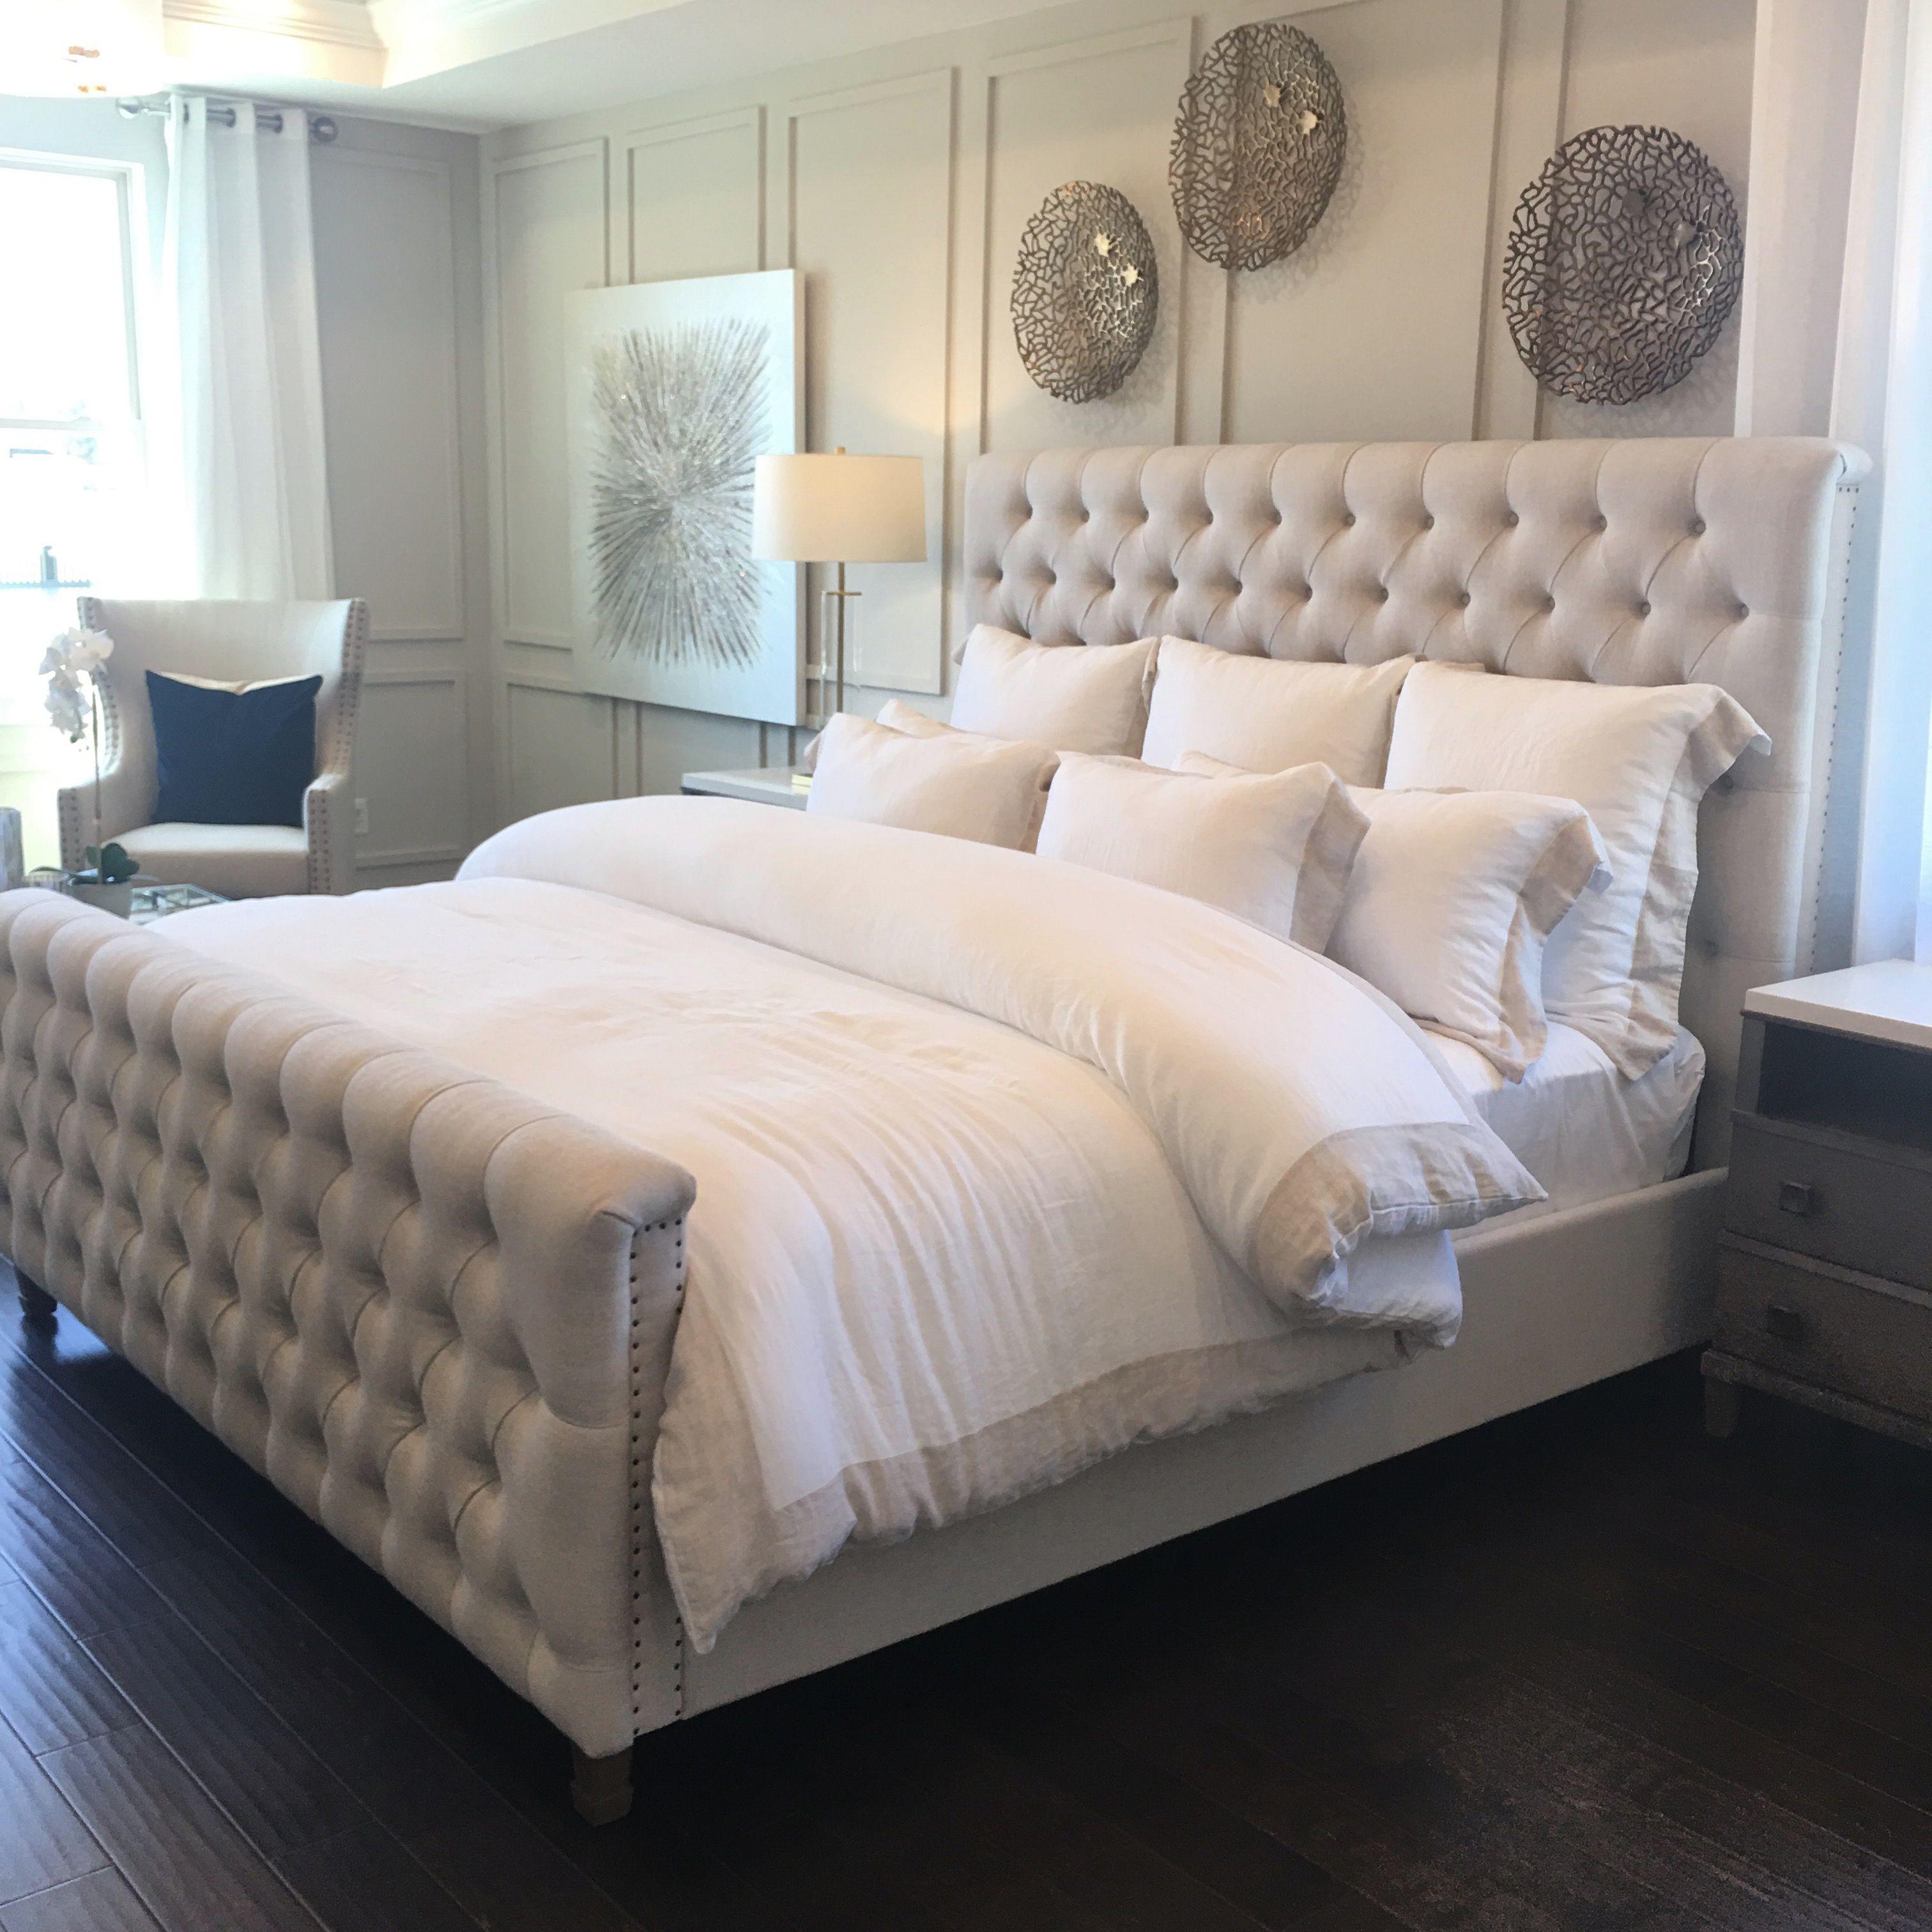 Coastal glam bedroom modern farmhouse glam bedroom (With